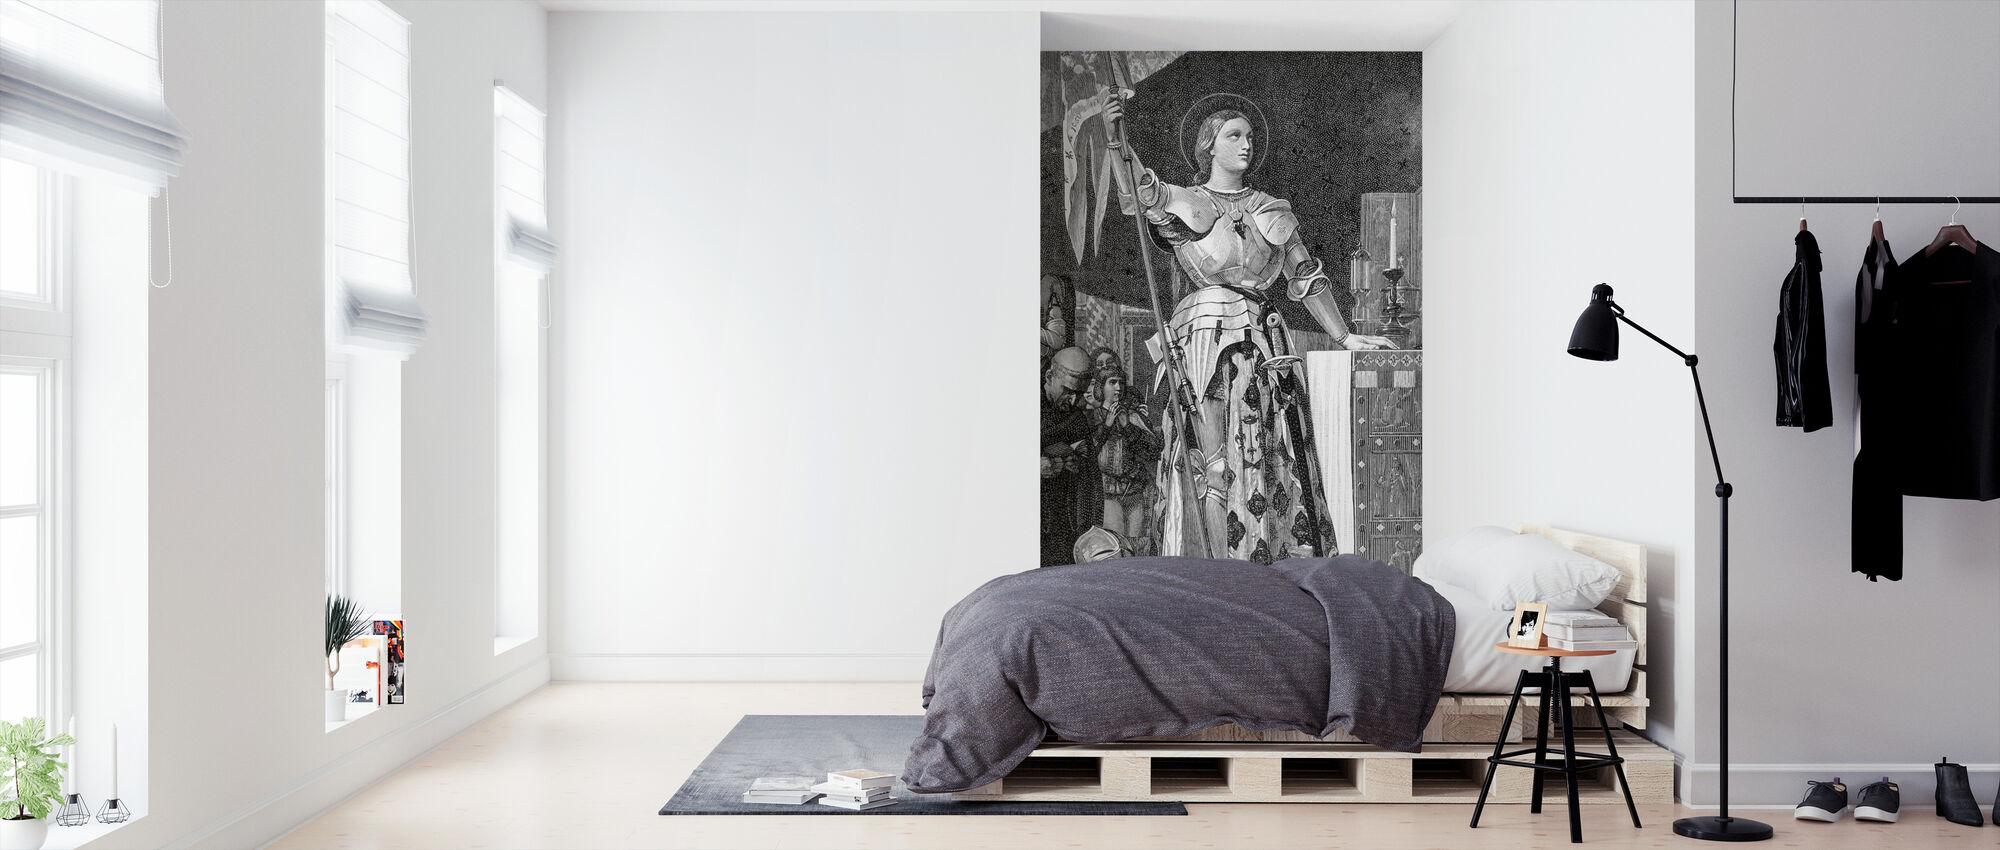 Joan of Arc neito Orleansin - Tapetti - Makuuhuone